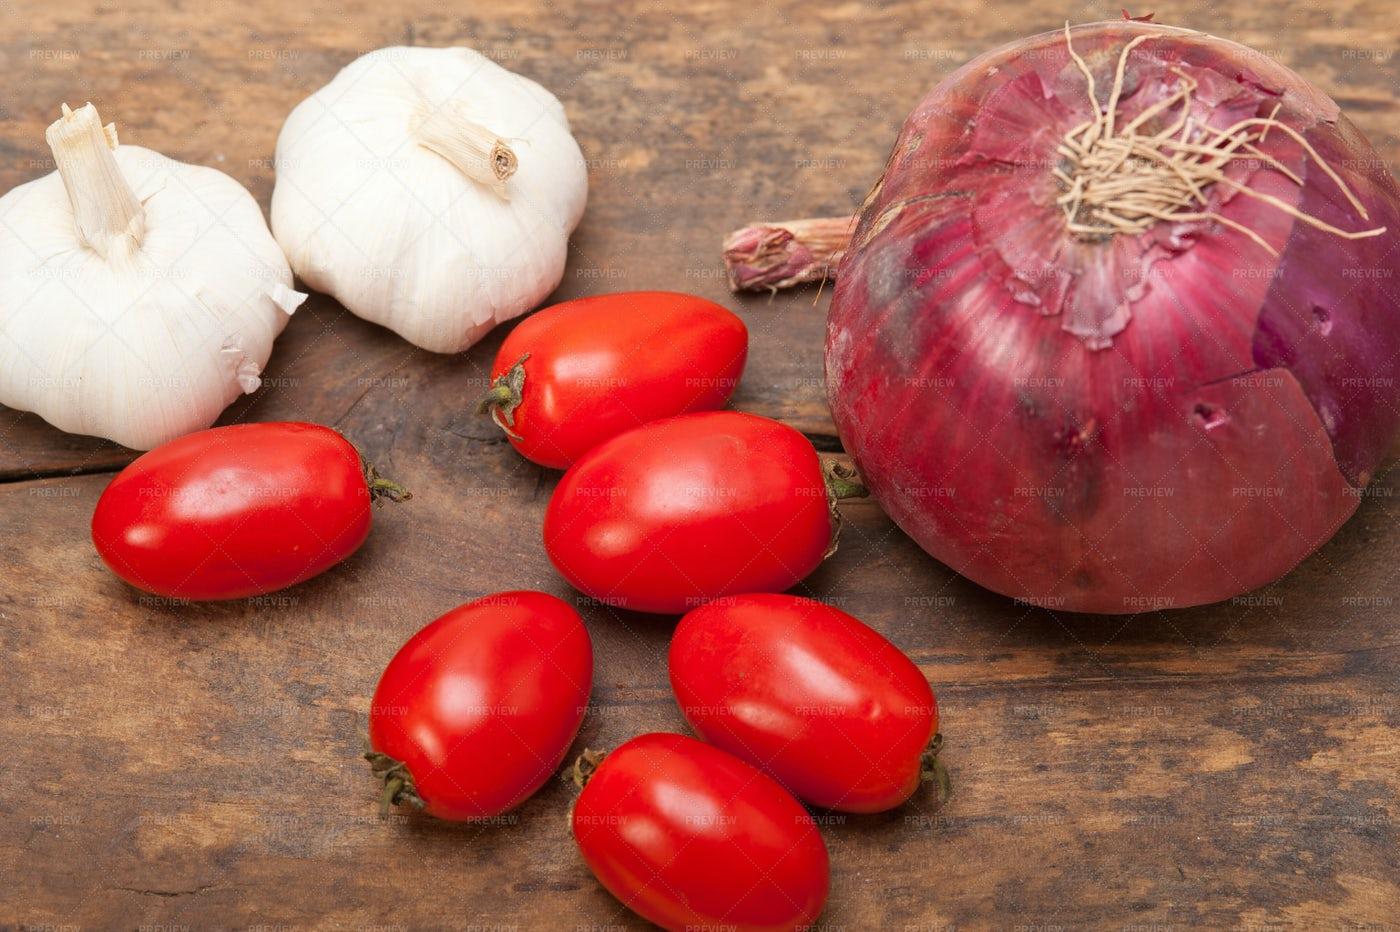 Onion, Garlic And Tomatoes: Stock Photos